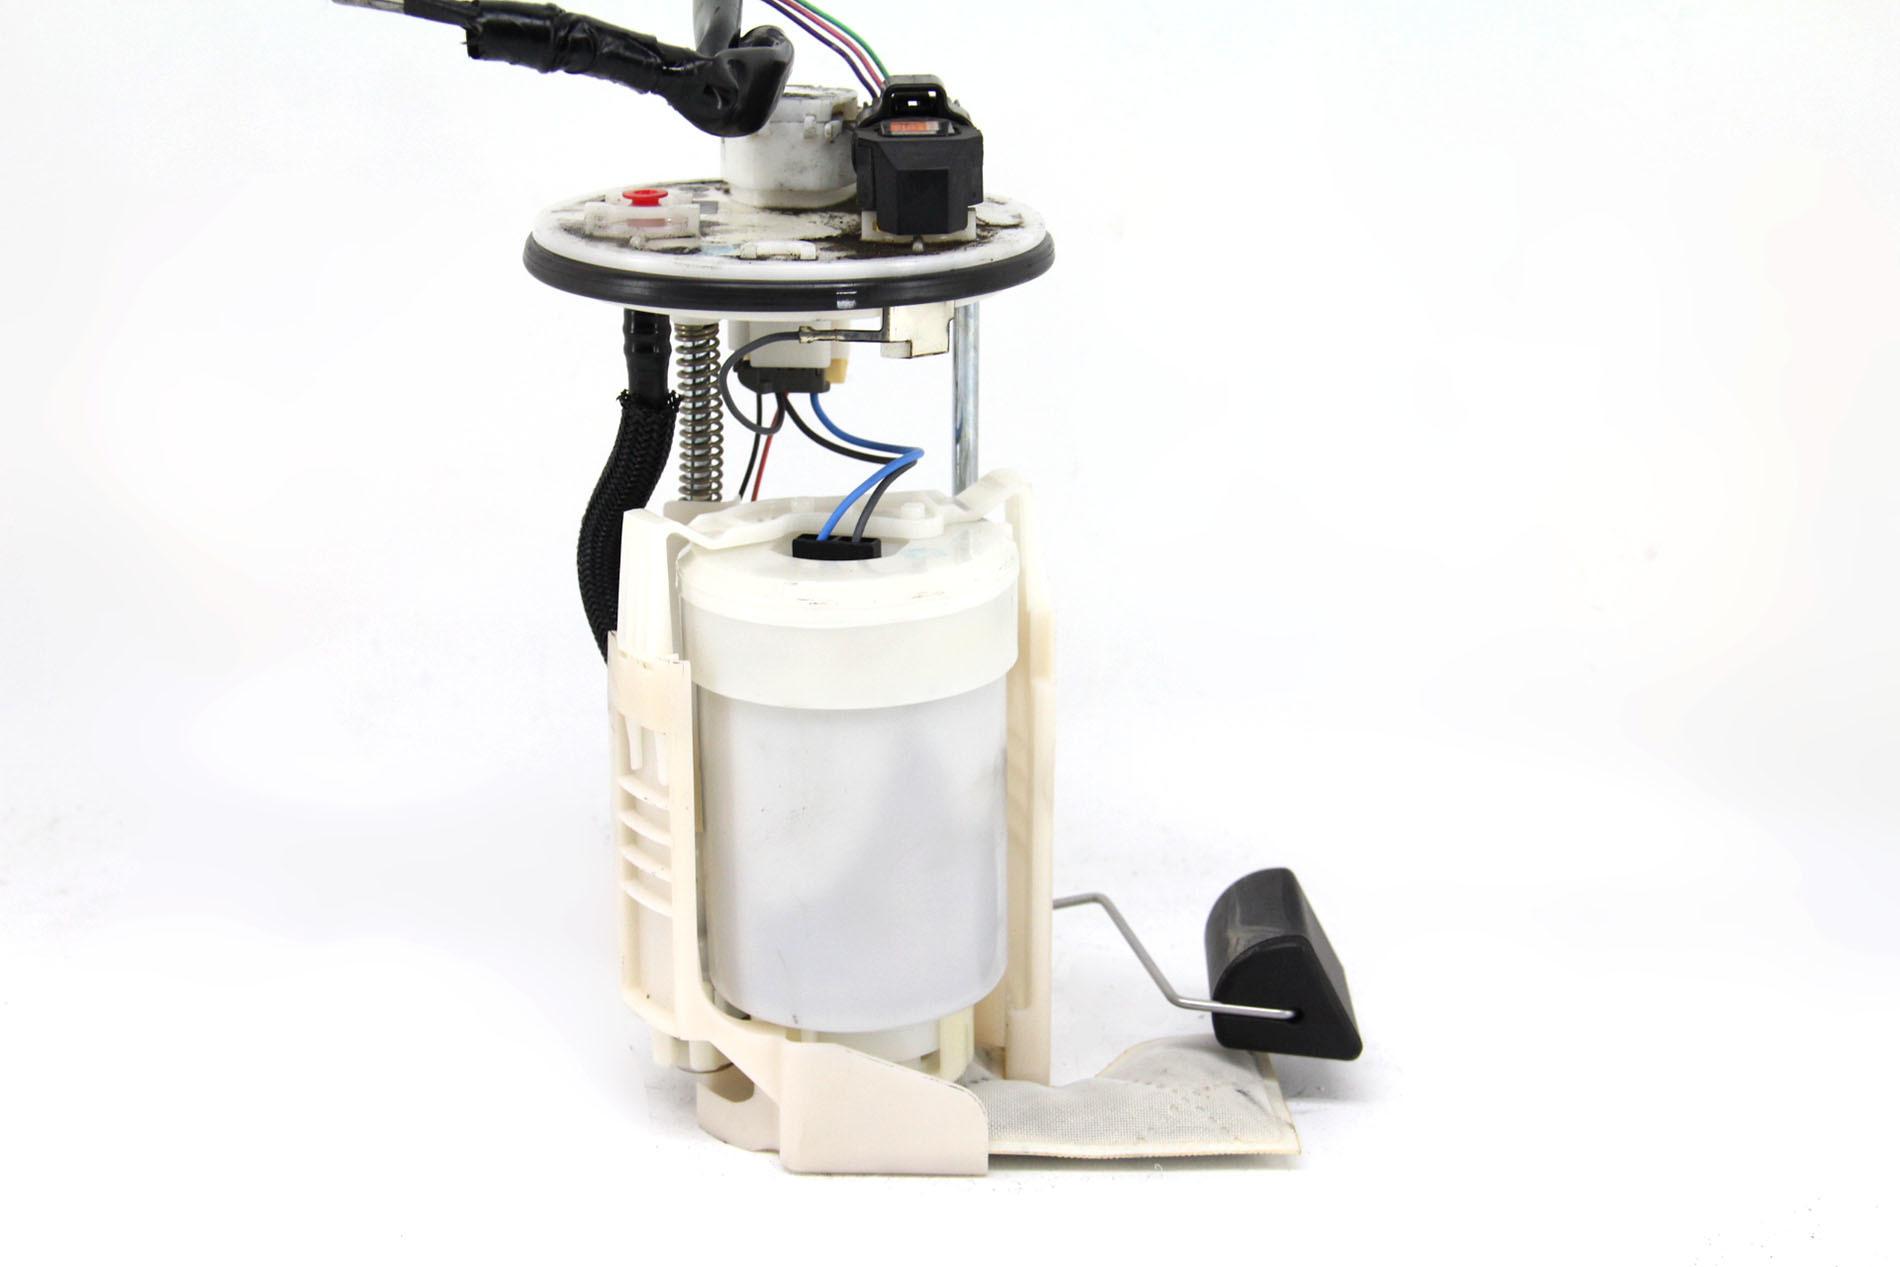 ... Toyota Camry Hybrid Fuel Filter Gas Pump 2.4L 77020-06230 OEM 07-11